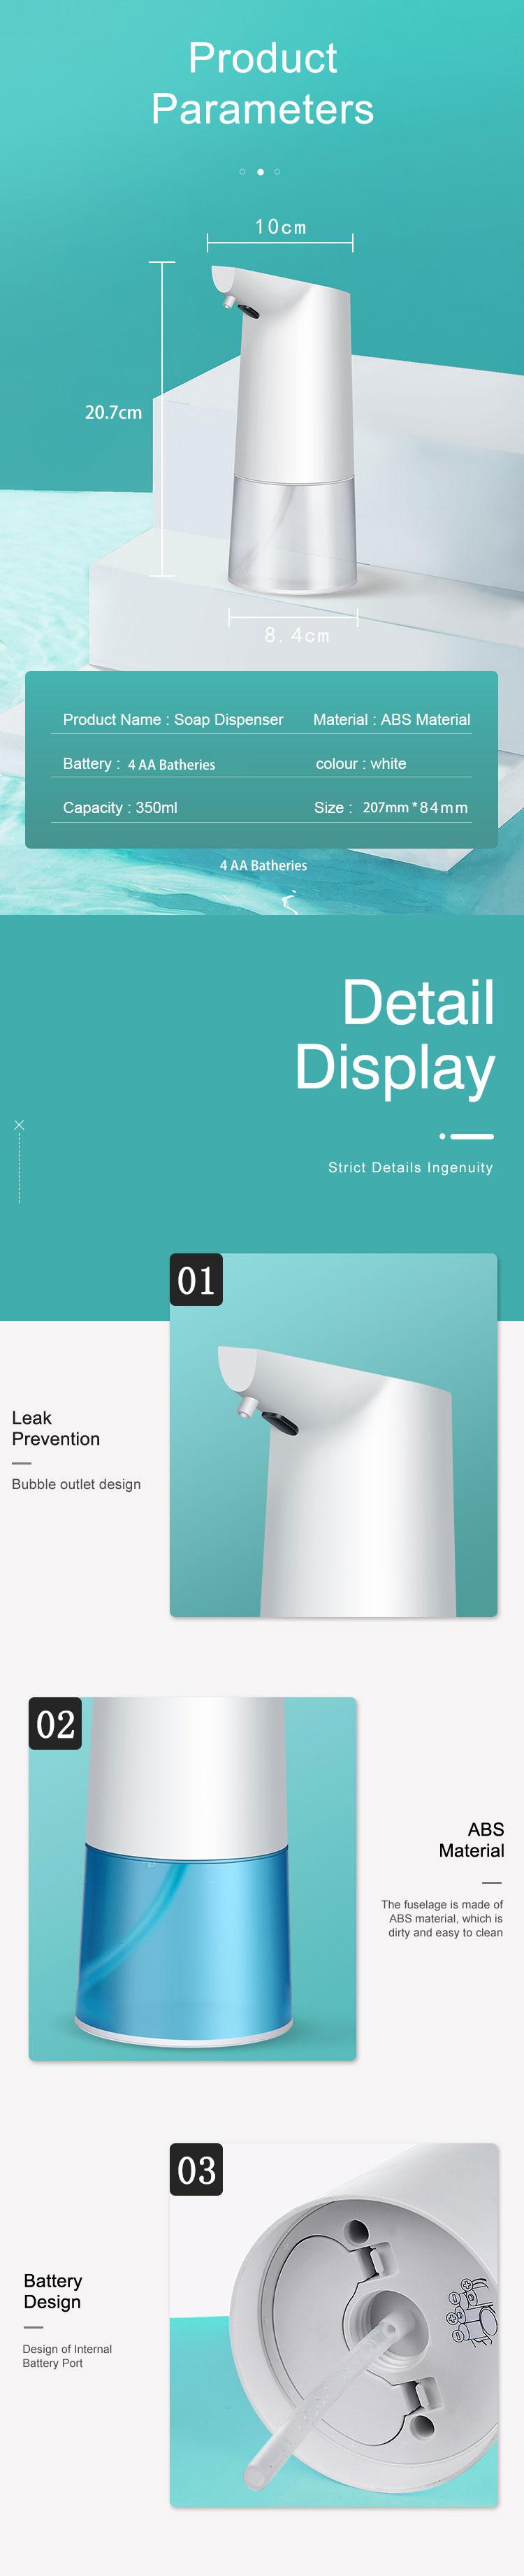 Touchless Bathroom Dispenser Smart Sensor Liquid Soap Dispenser for Kitchen Hand Free Automatic Soap Dispenser 1